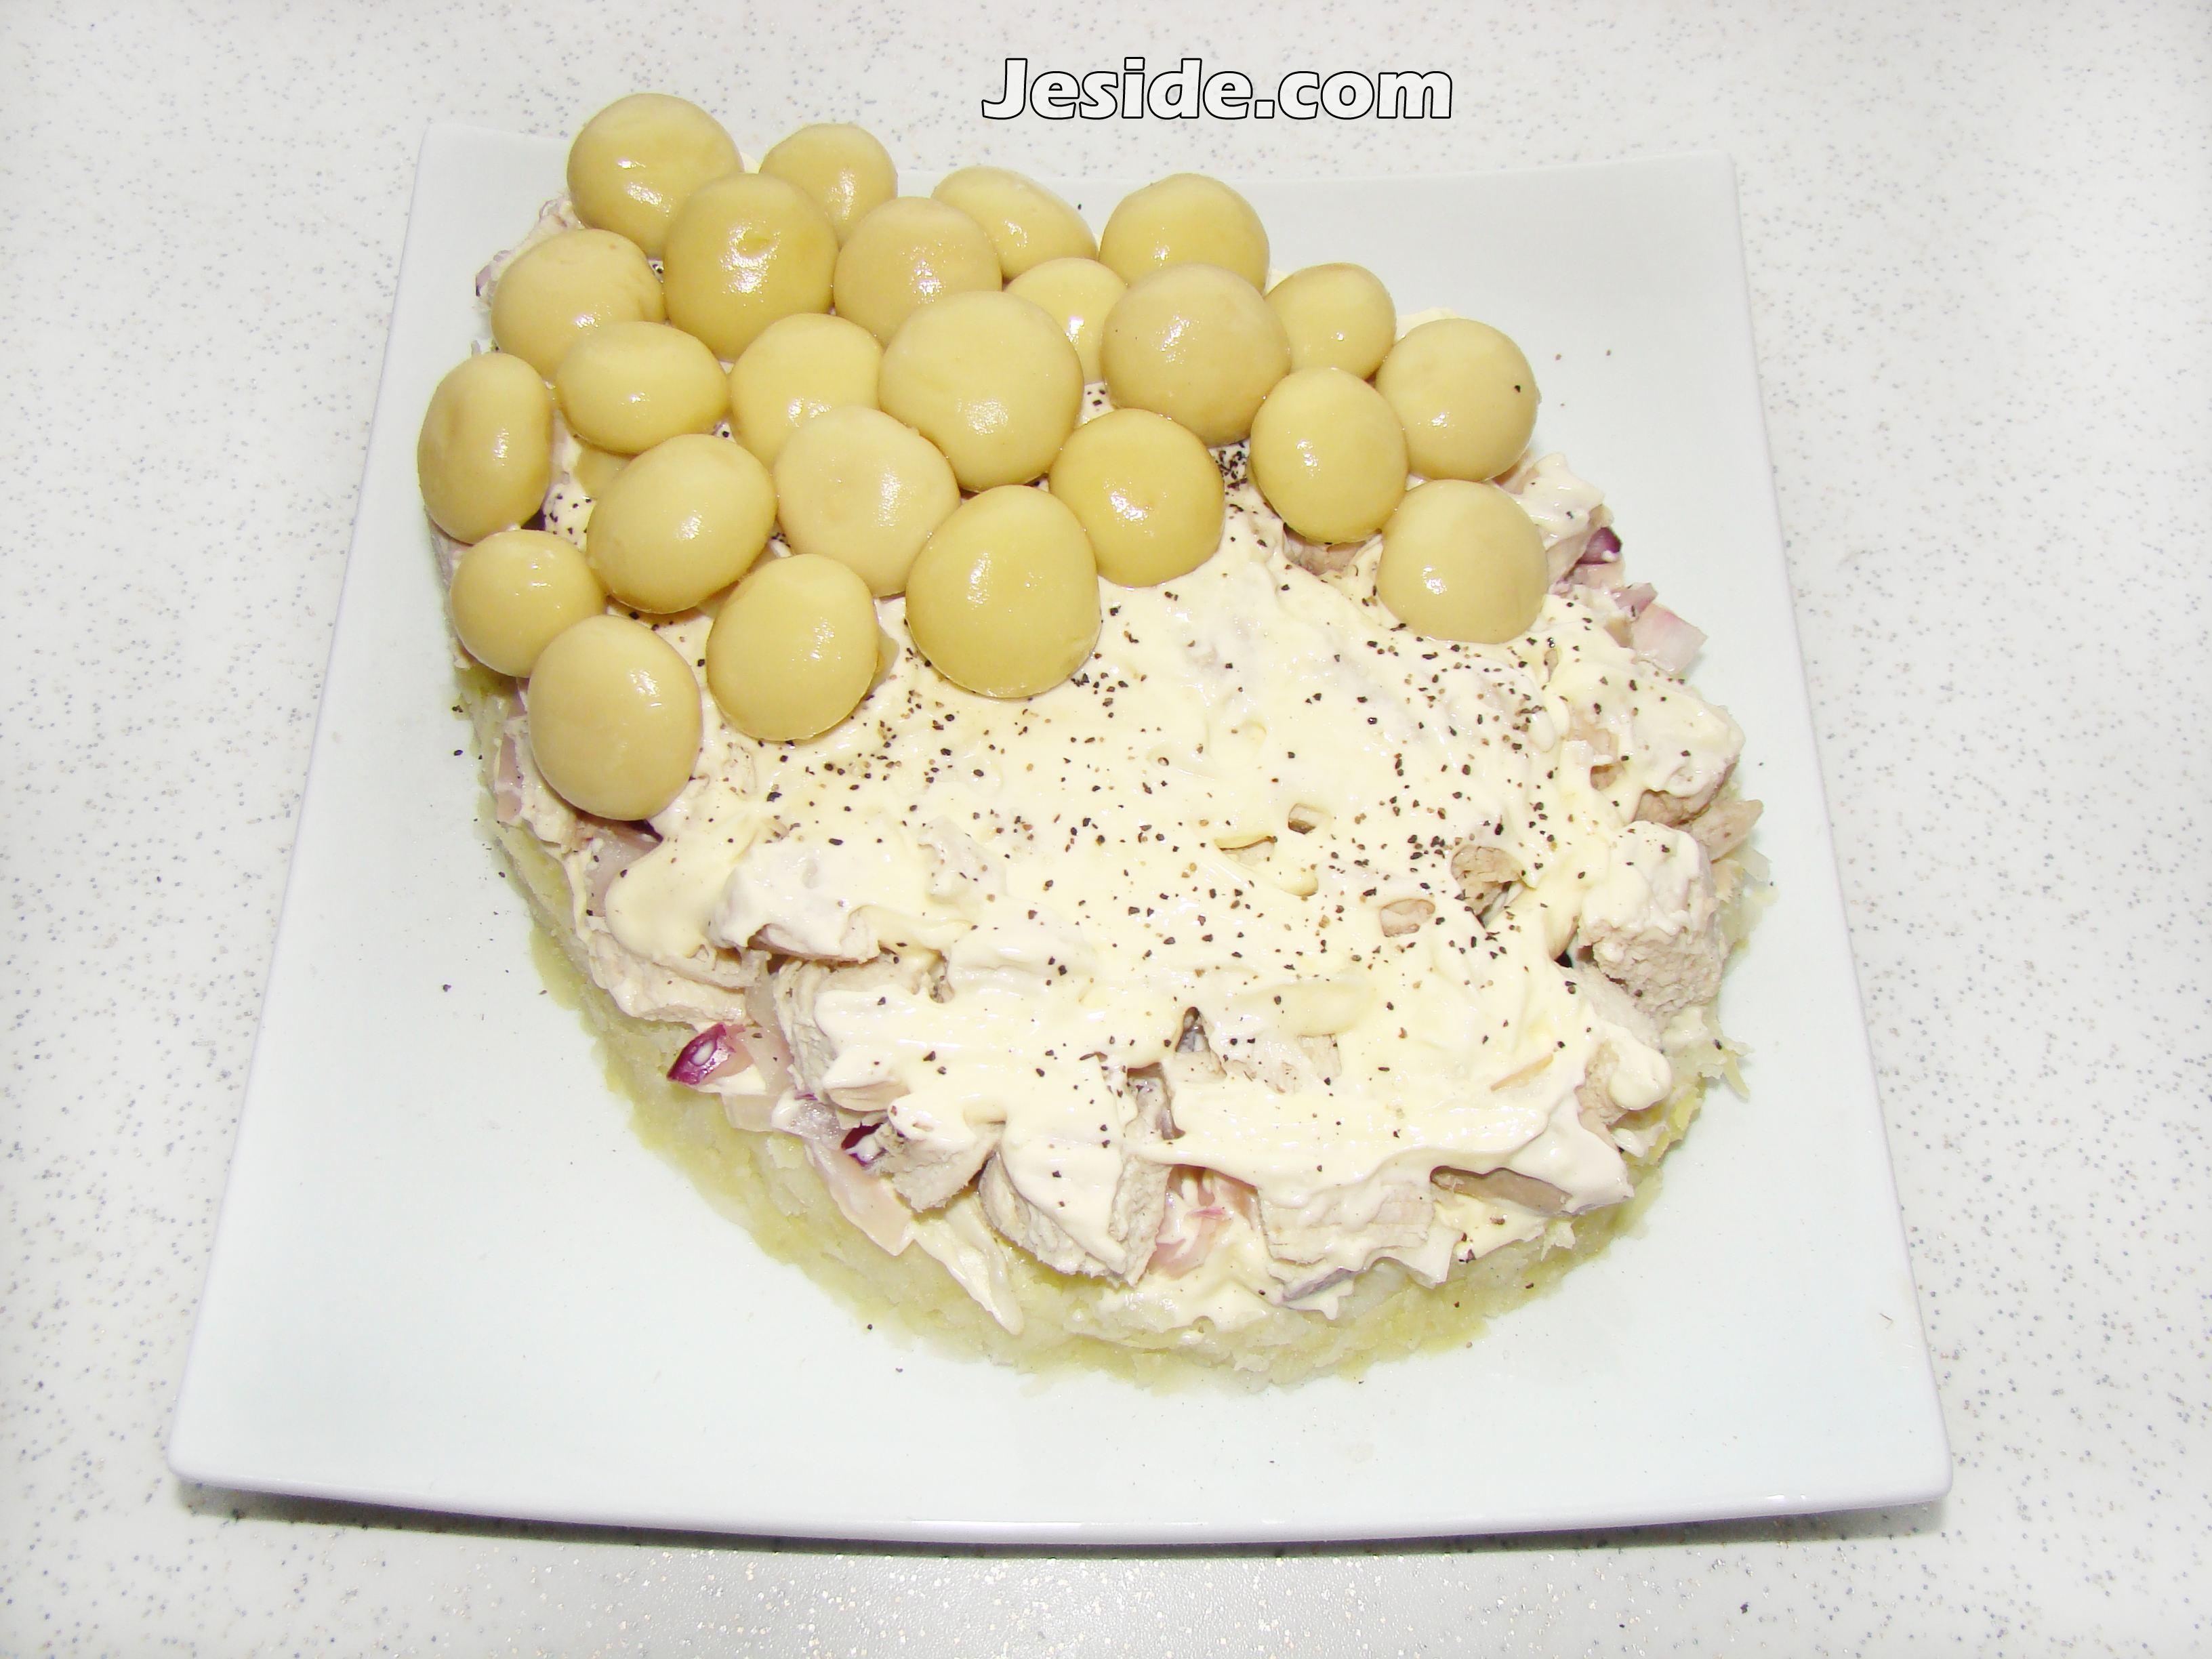 Салат по слоям с шампиньонами